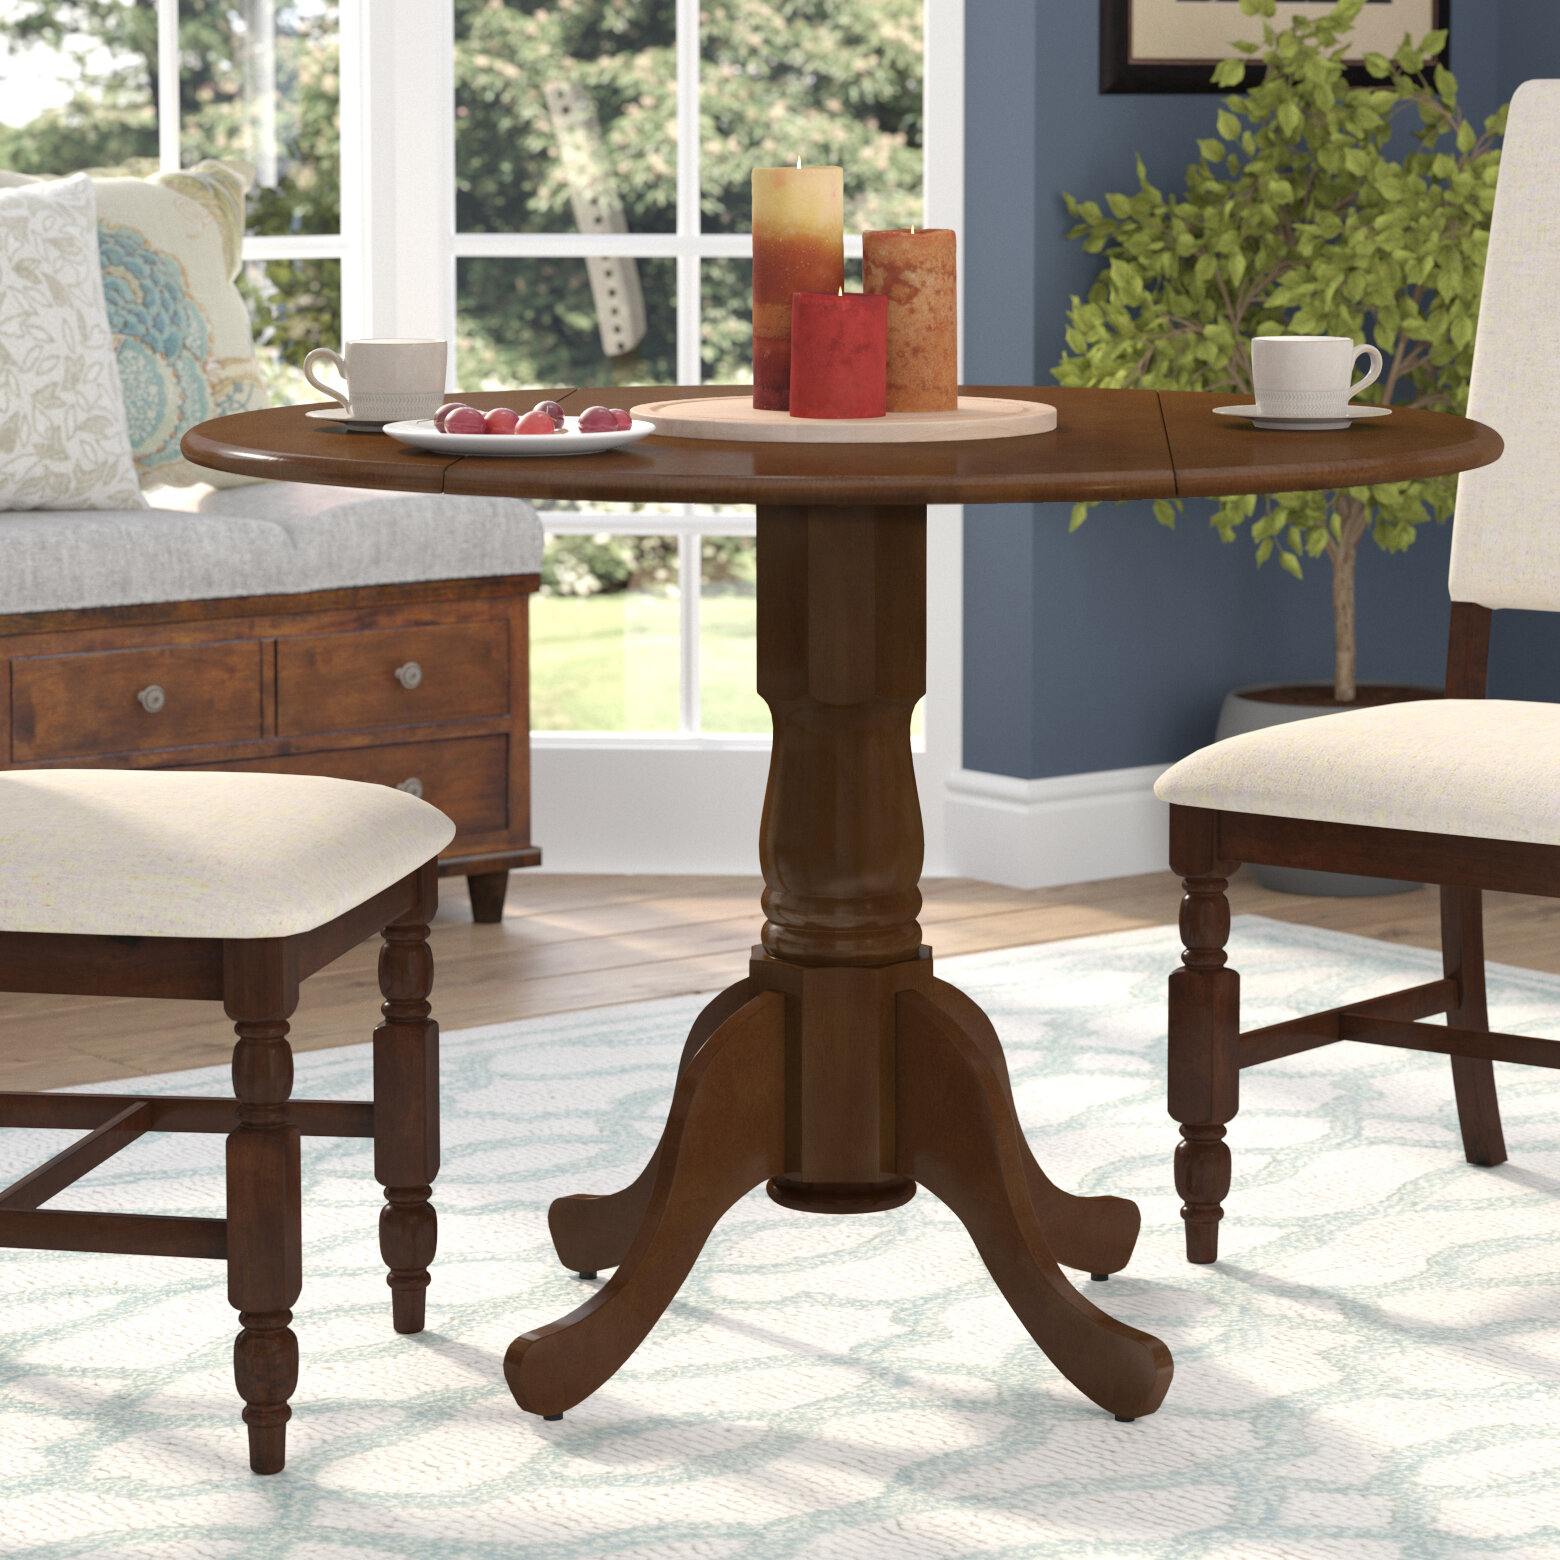 August Grove Spruill Drop Leaf Solid Wood Rubberwood Dining Table Reviews Wayfair